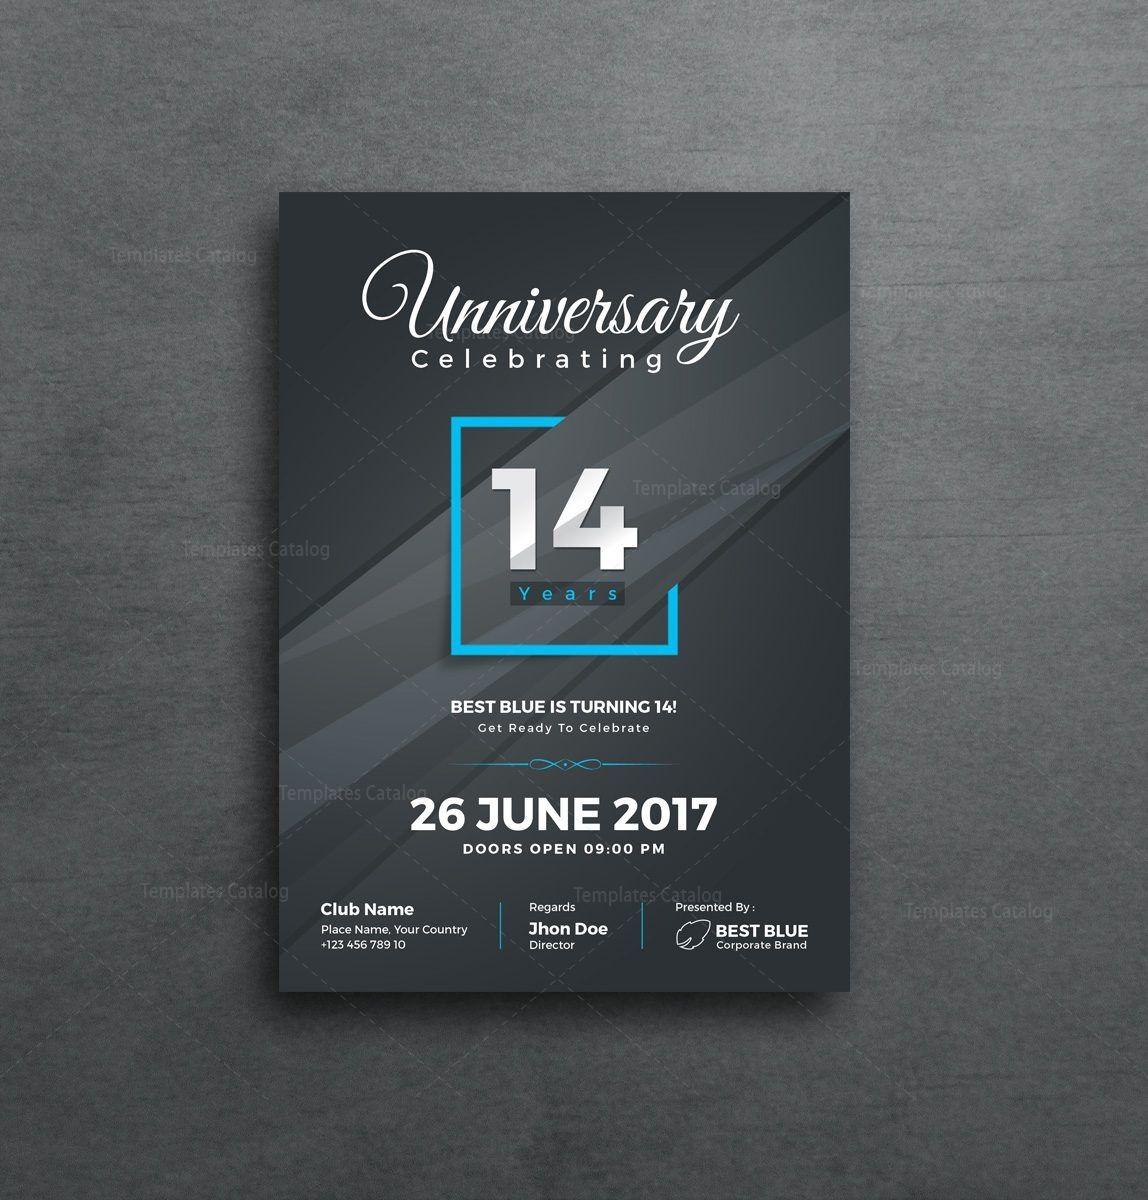 Categories Corporate Invitation Design